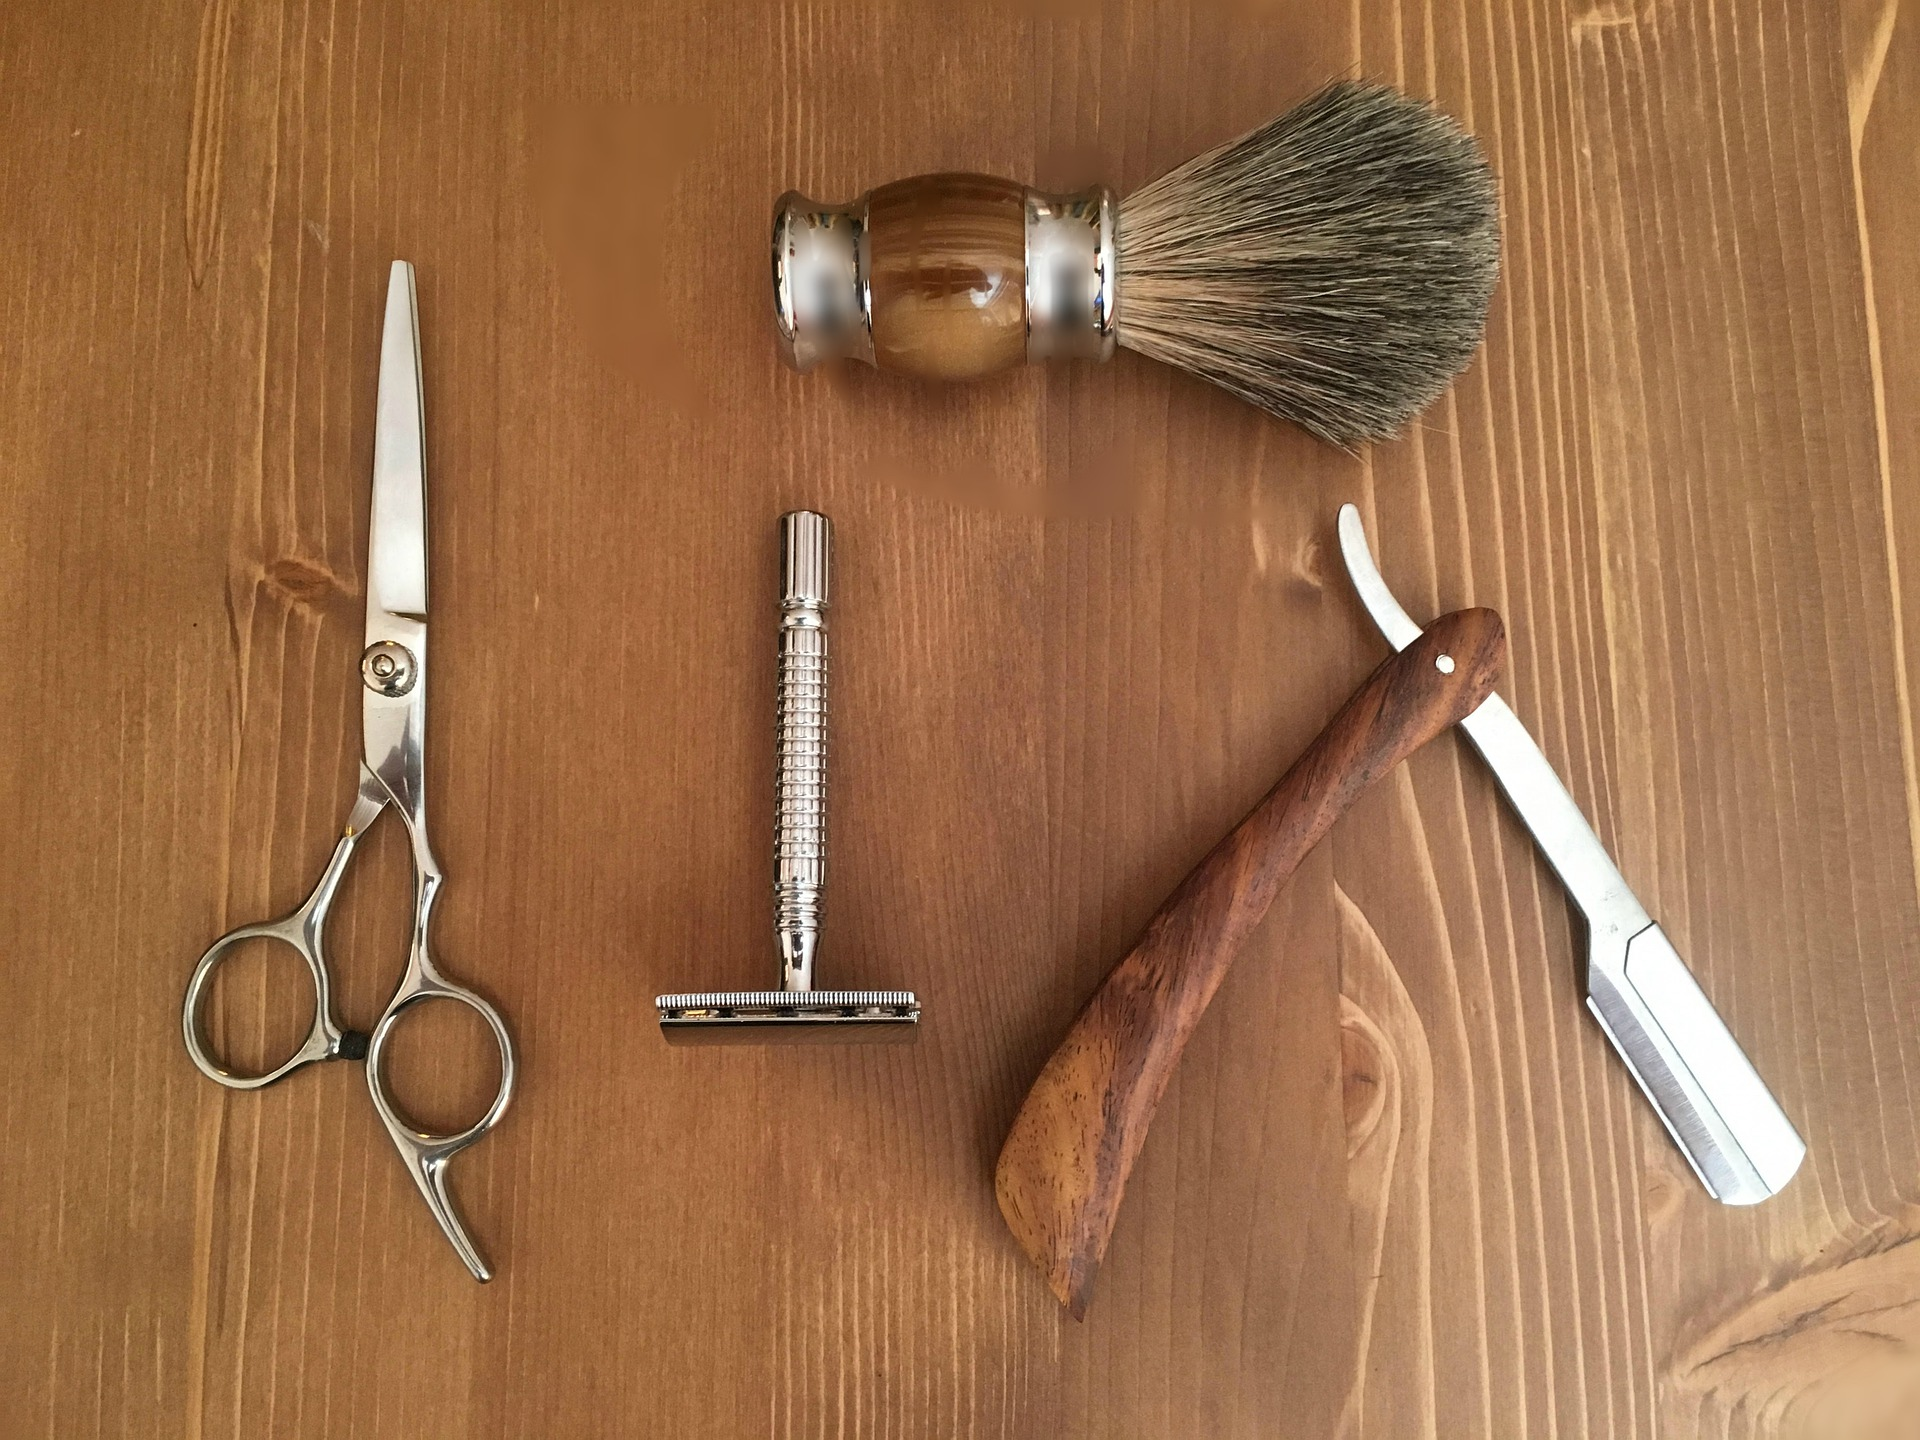 tool-3134809_1920.jpg